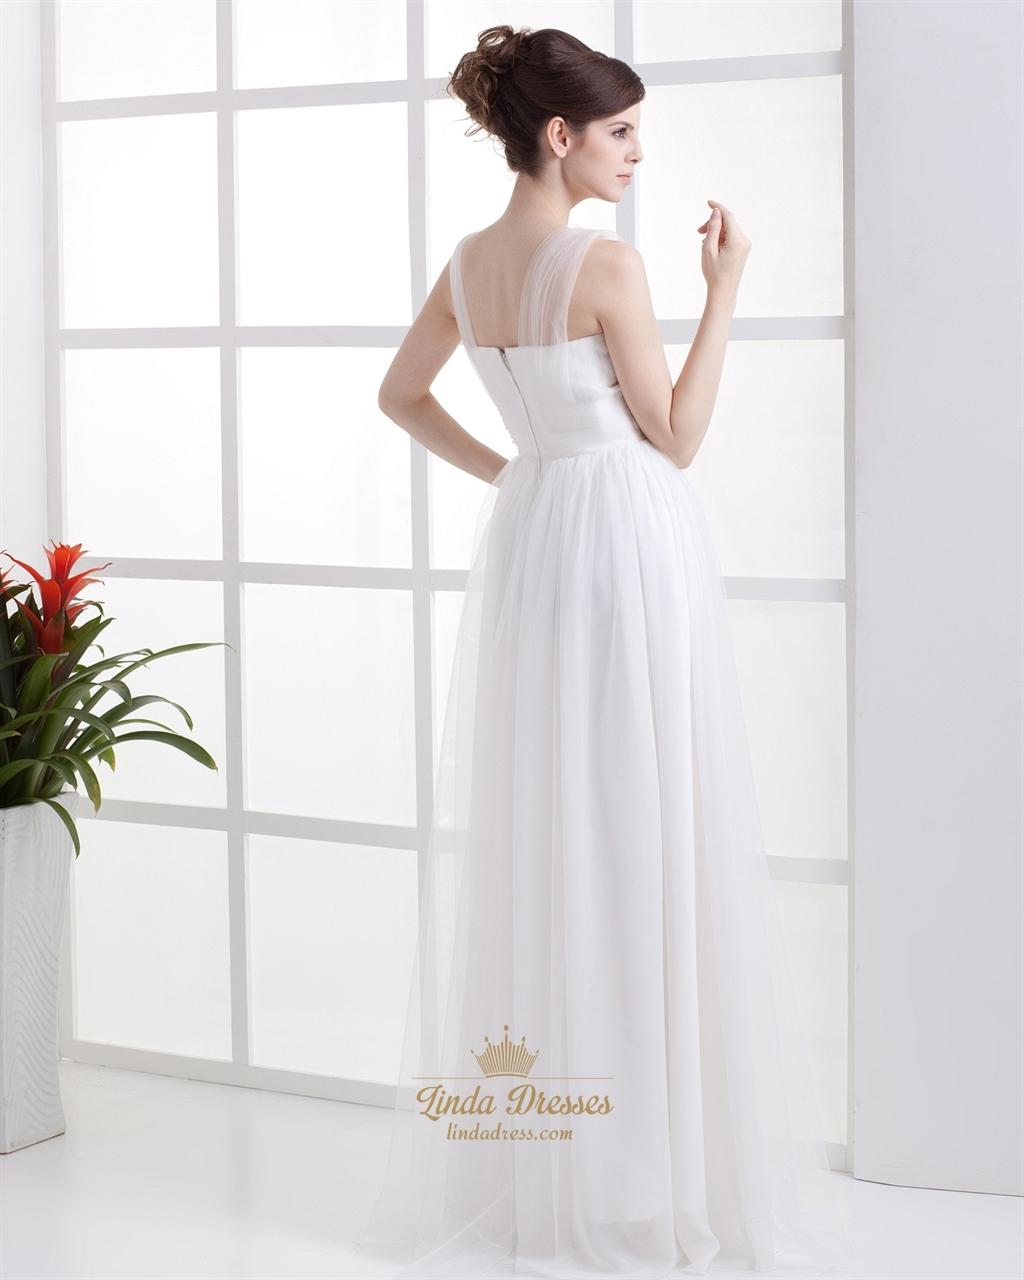 Elegant Simple Ivory Tulle Empire Waist Wedding Dress With